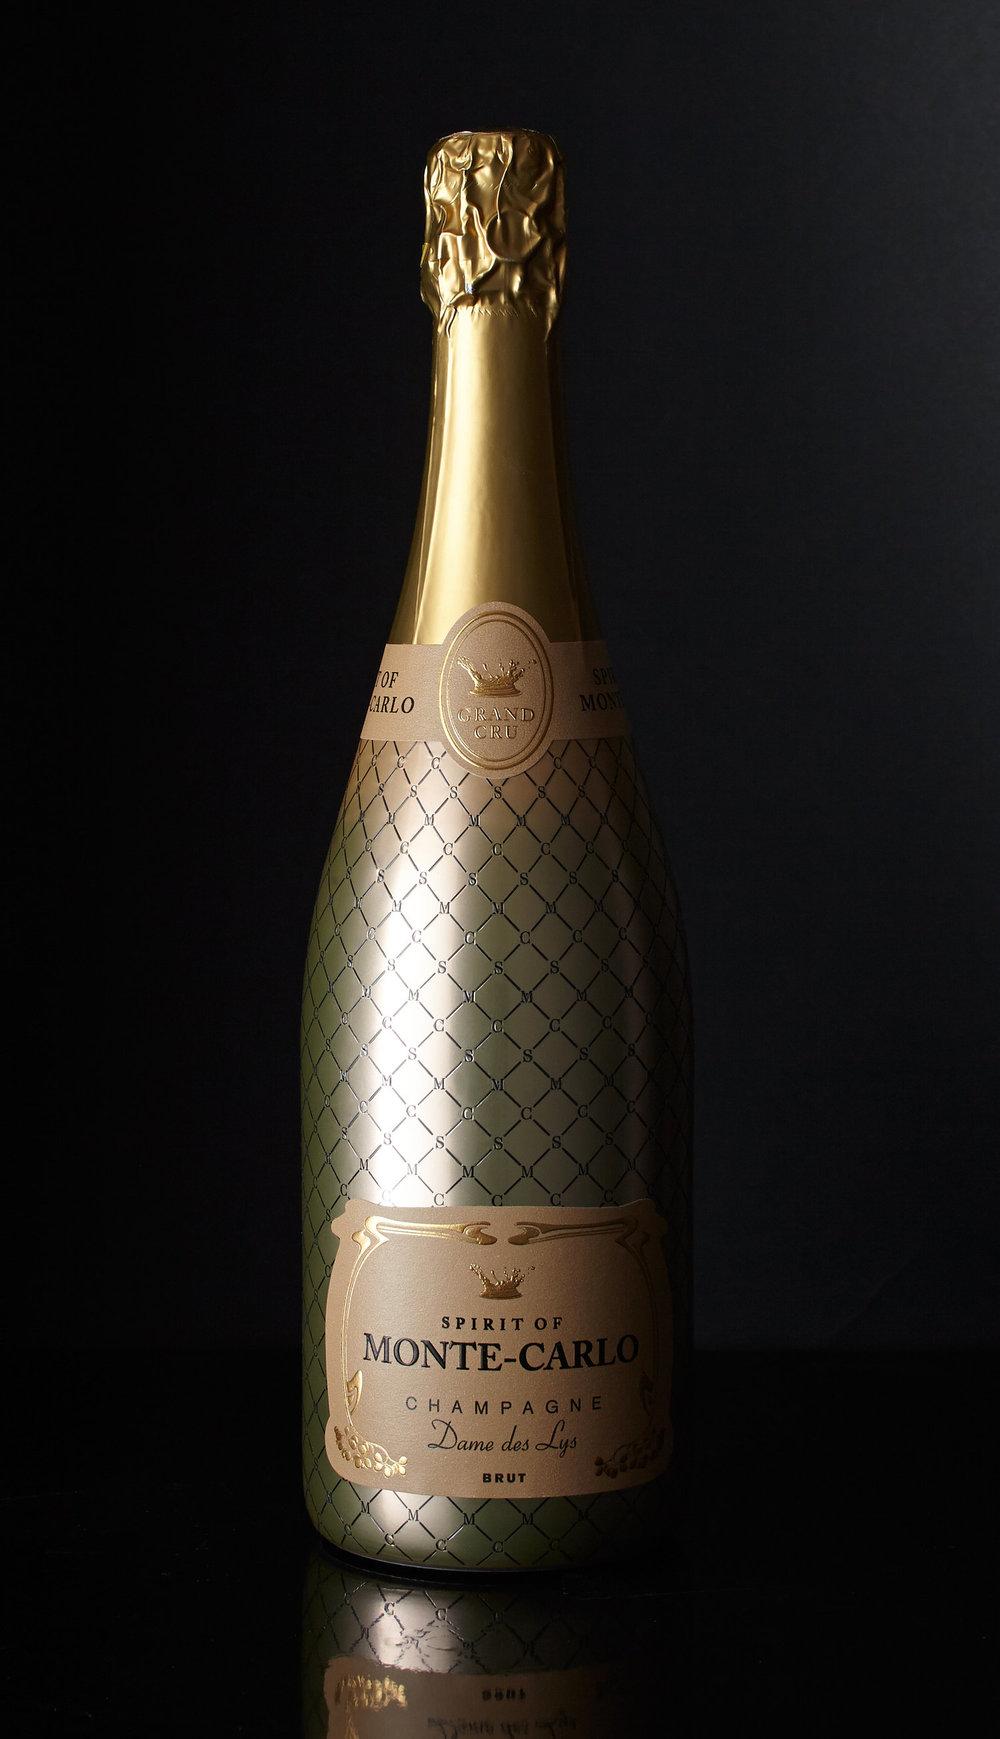 01_Champagne+Montecarlo+still+life7934.jpg